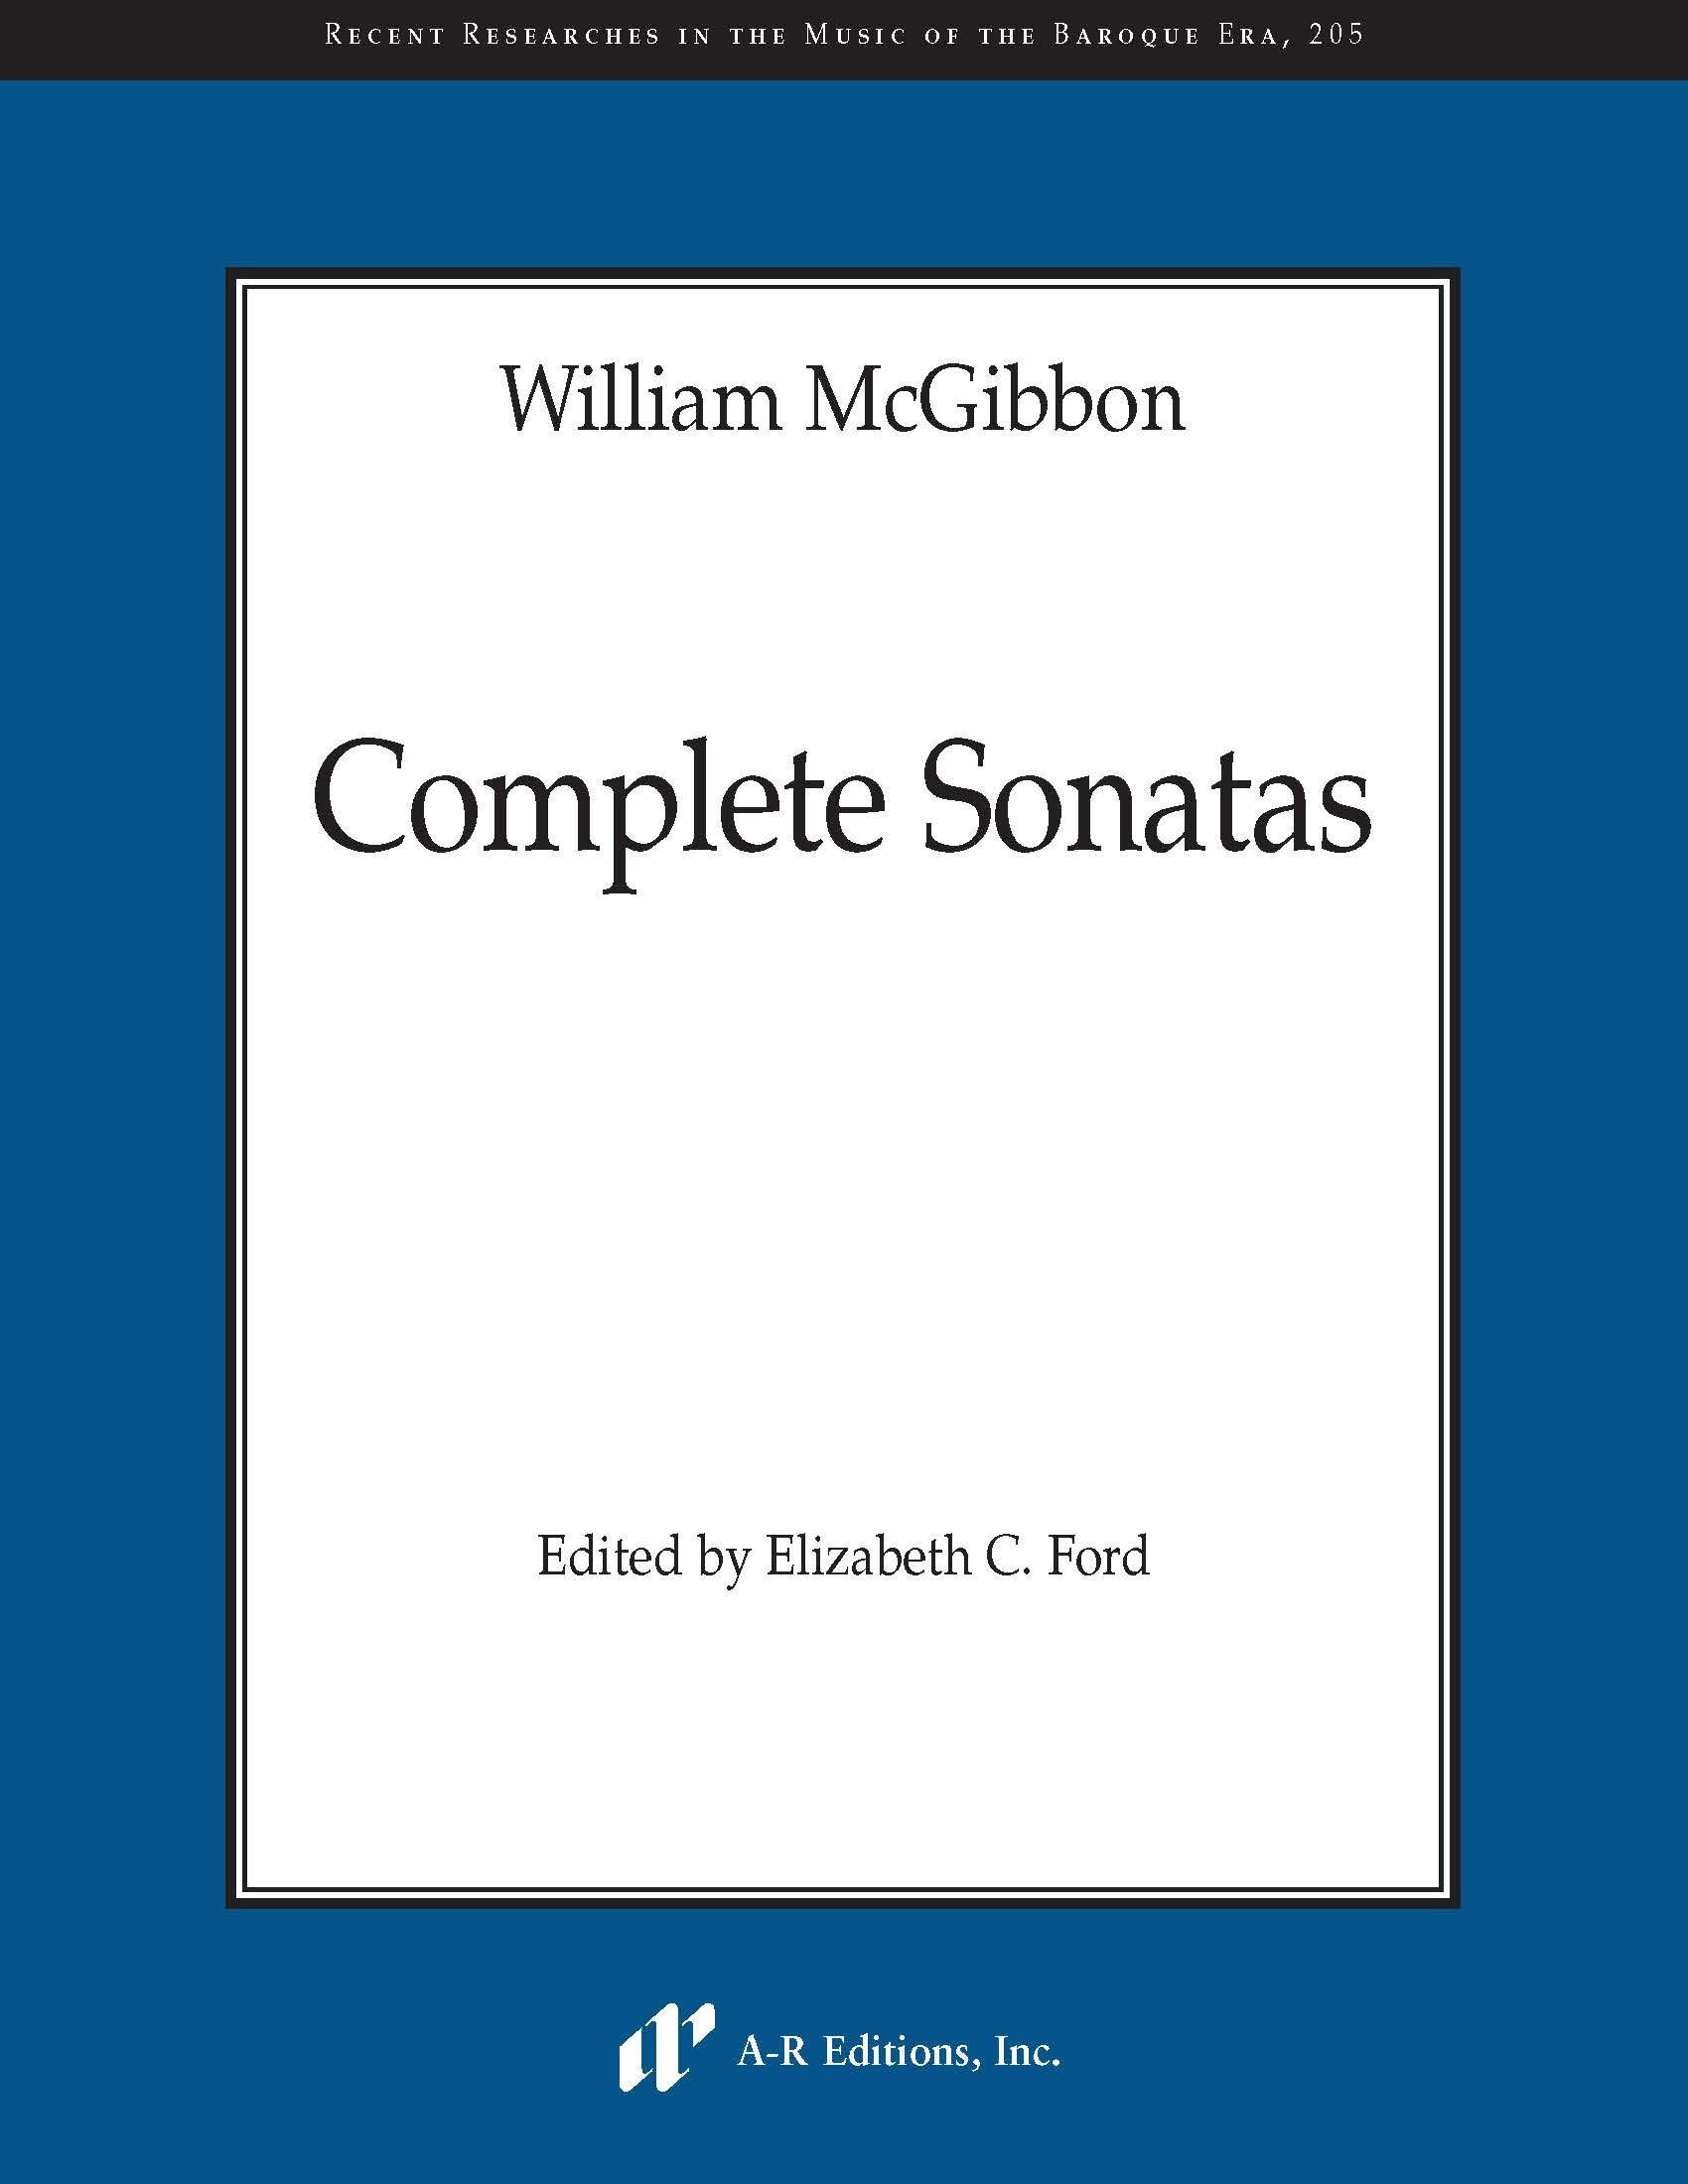 McGibbon: Complete Sonatas